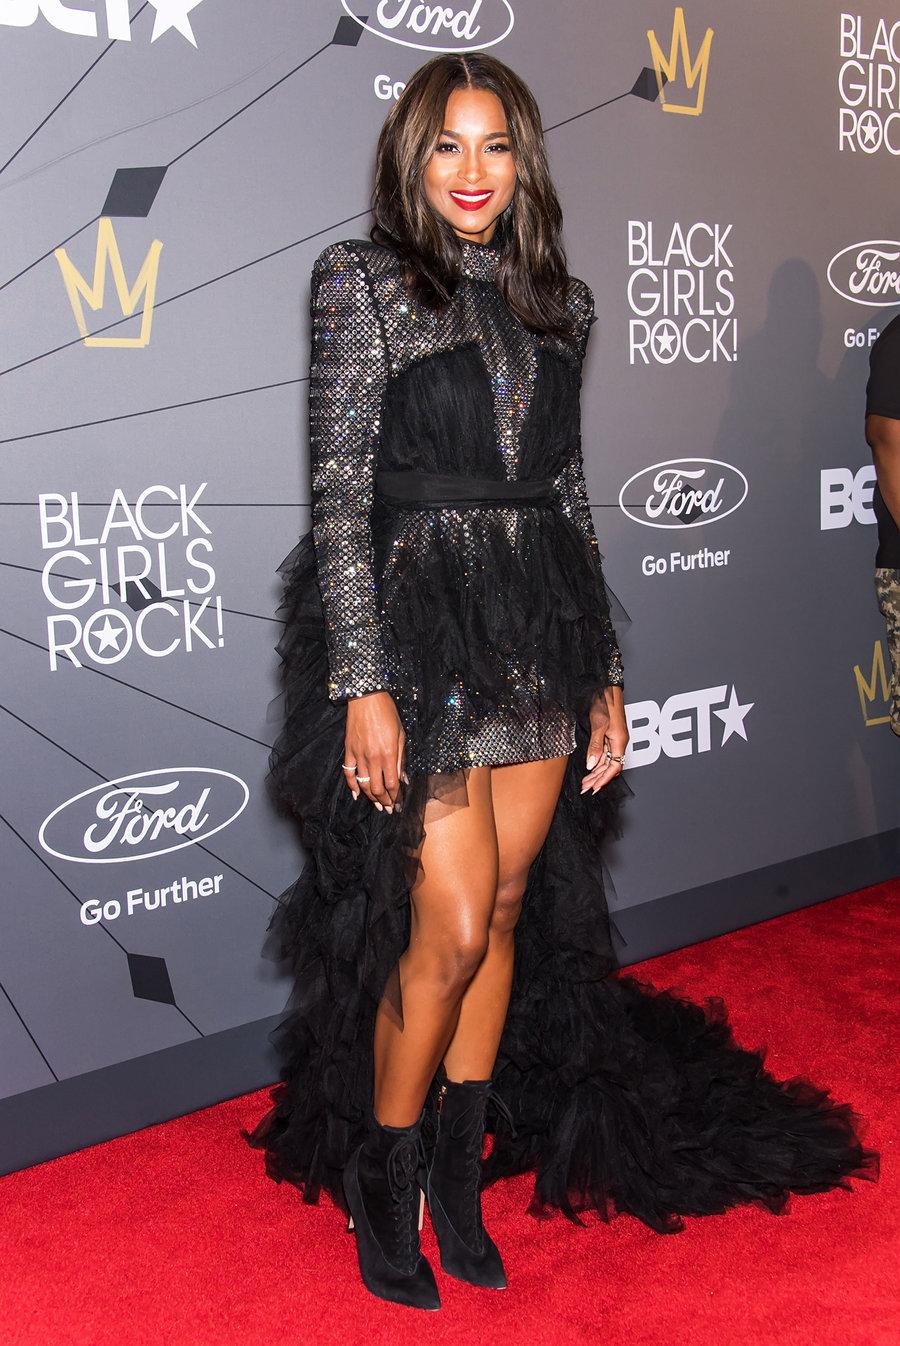 ciara-black-girls-rock-red-carpet-2018-billboard-1240